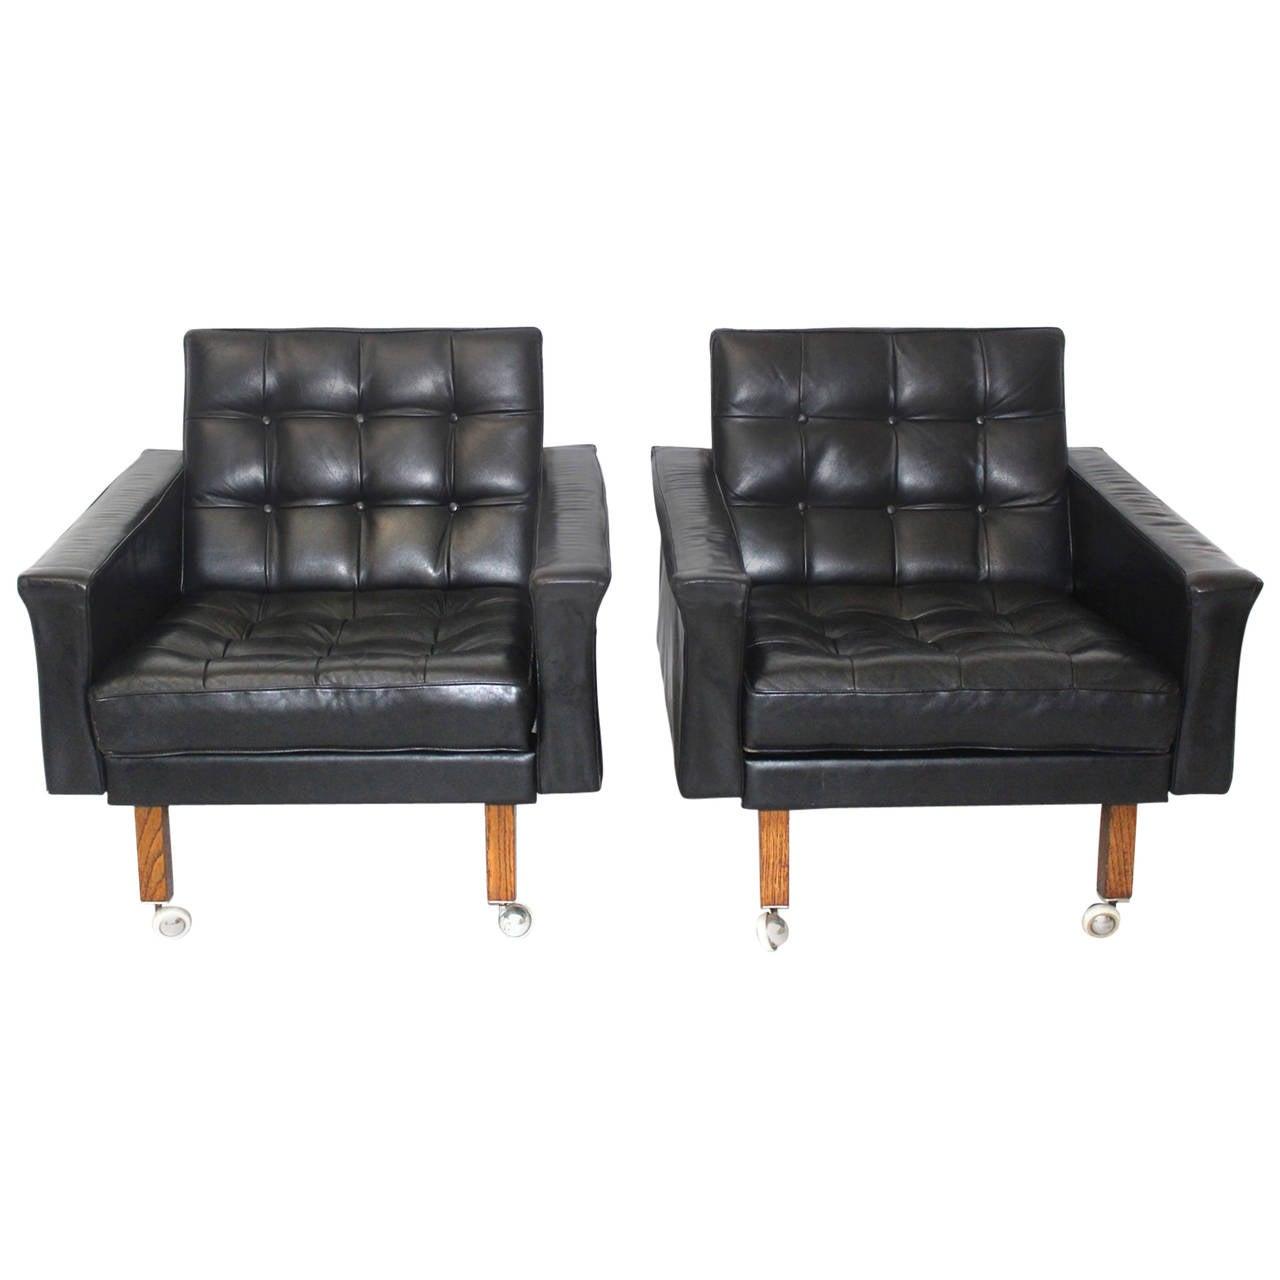 Black Leather Pair of Armchairs by Johannes Spalt, Austria, circa 1959